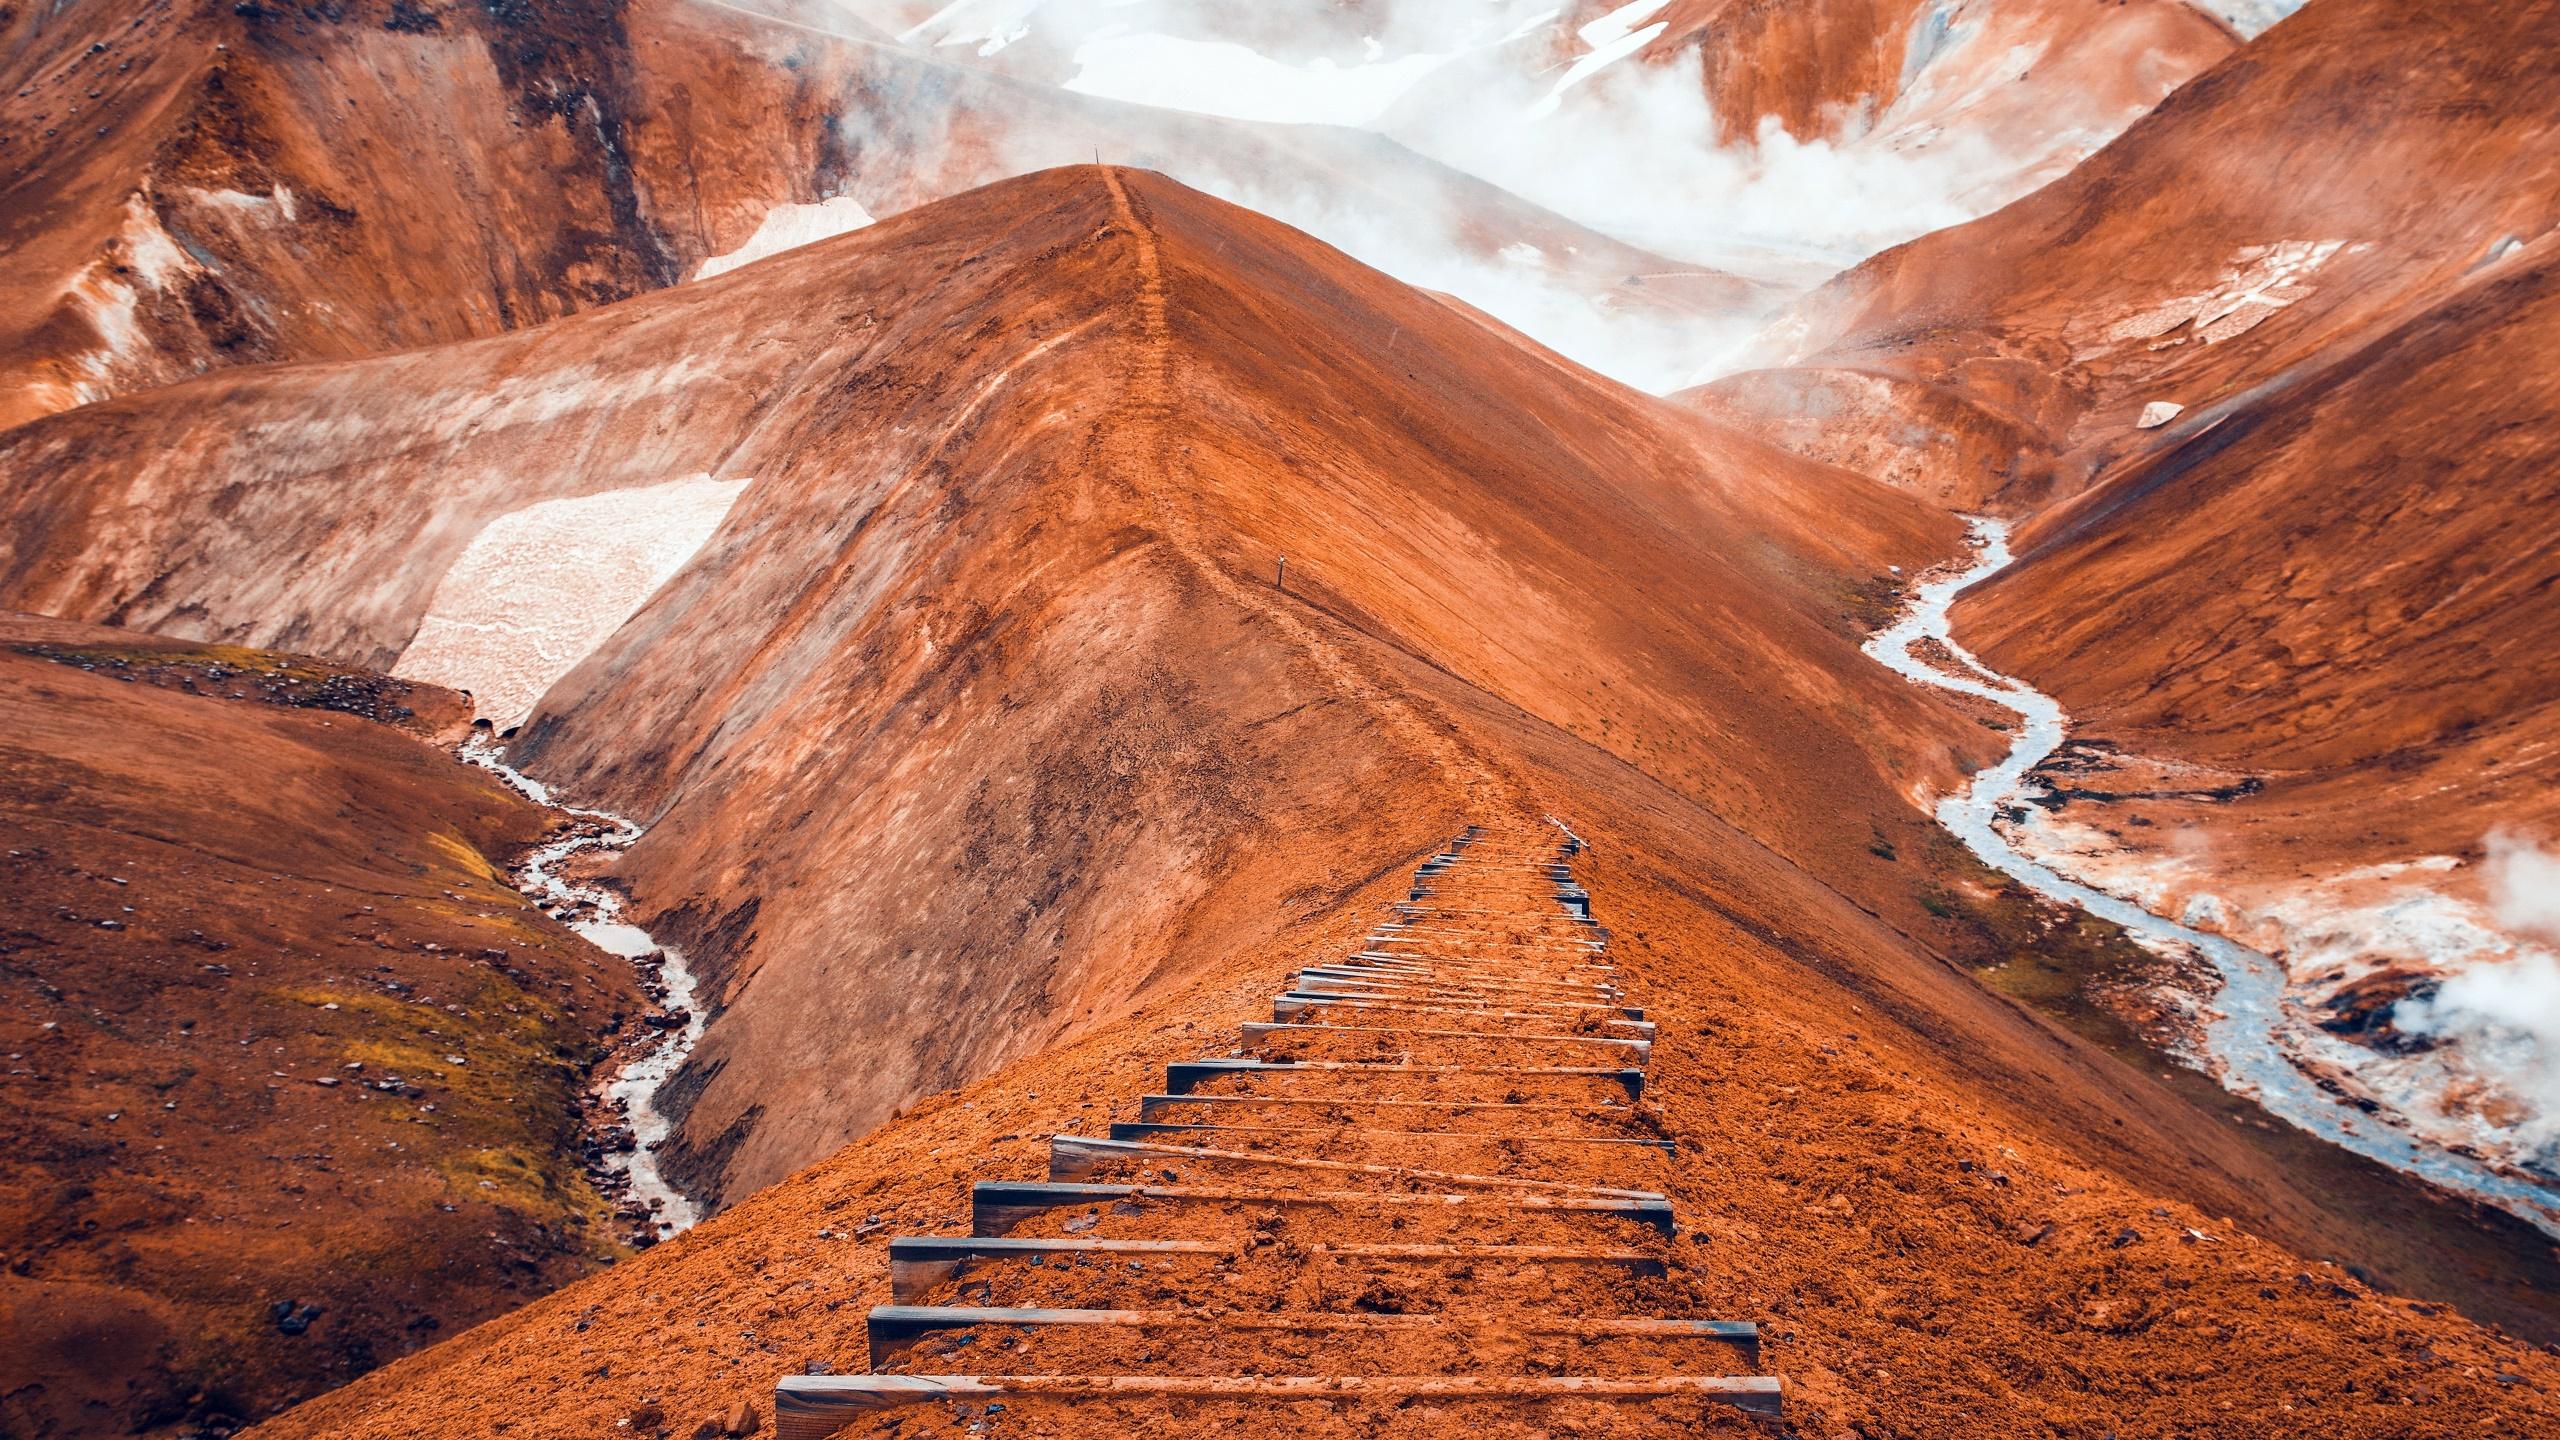 Wallpaper Iceland Nature Landscape 2560x1440 Wallpapermaniac 1933395 Hd Wallpapers Wallhere